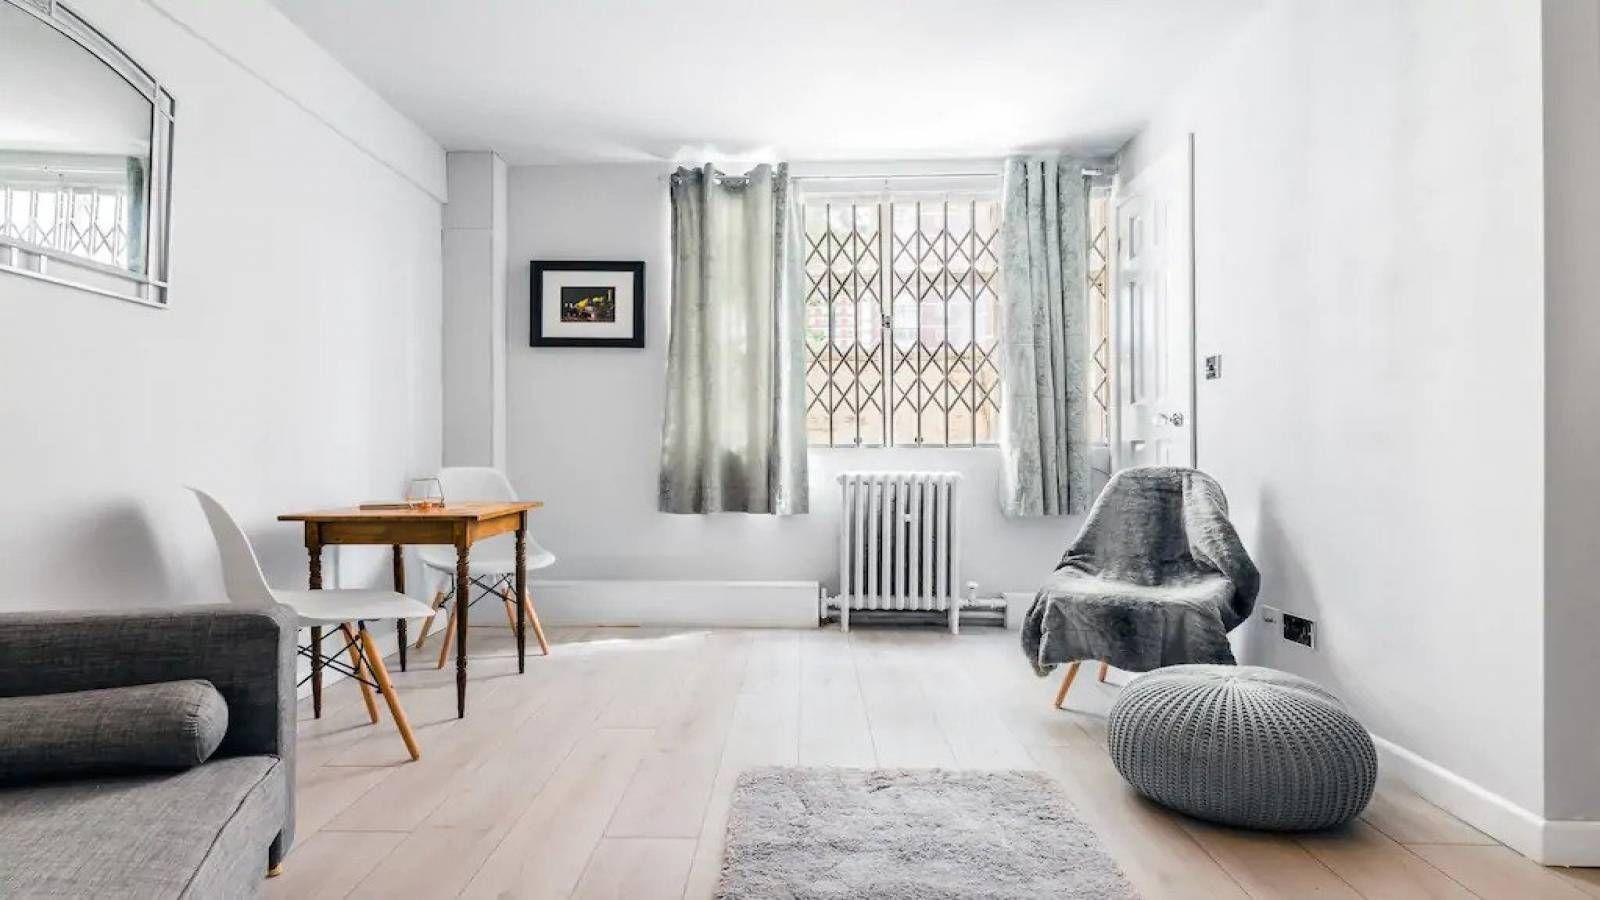 Interior design for double bedroom flat cosy bedroom flat for rent in hammersmith u fulham ref